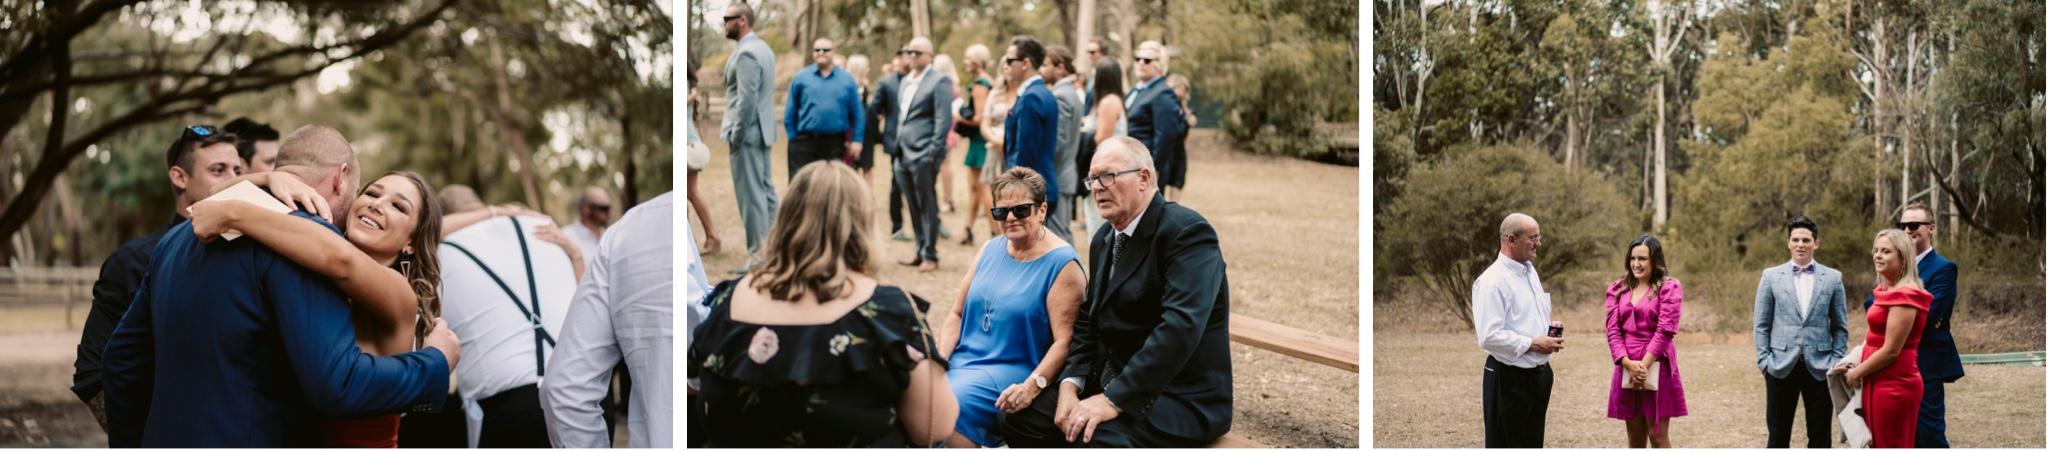 Mornington Peninsula Wedding Photography38.jpg